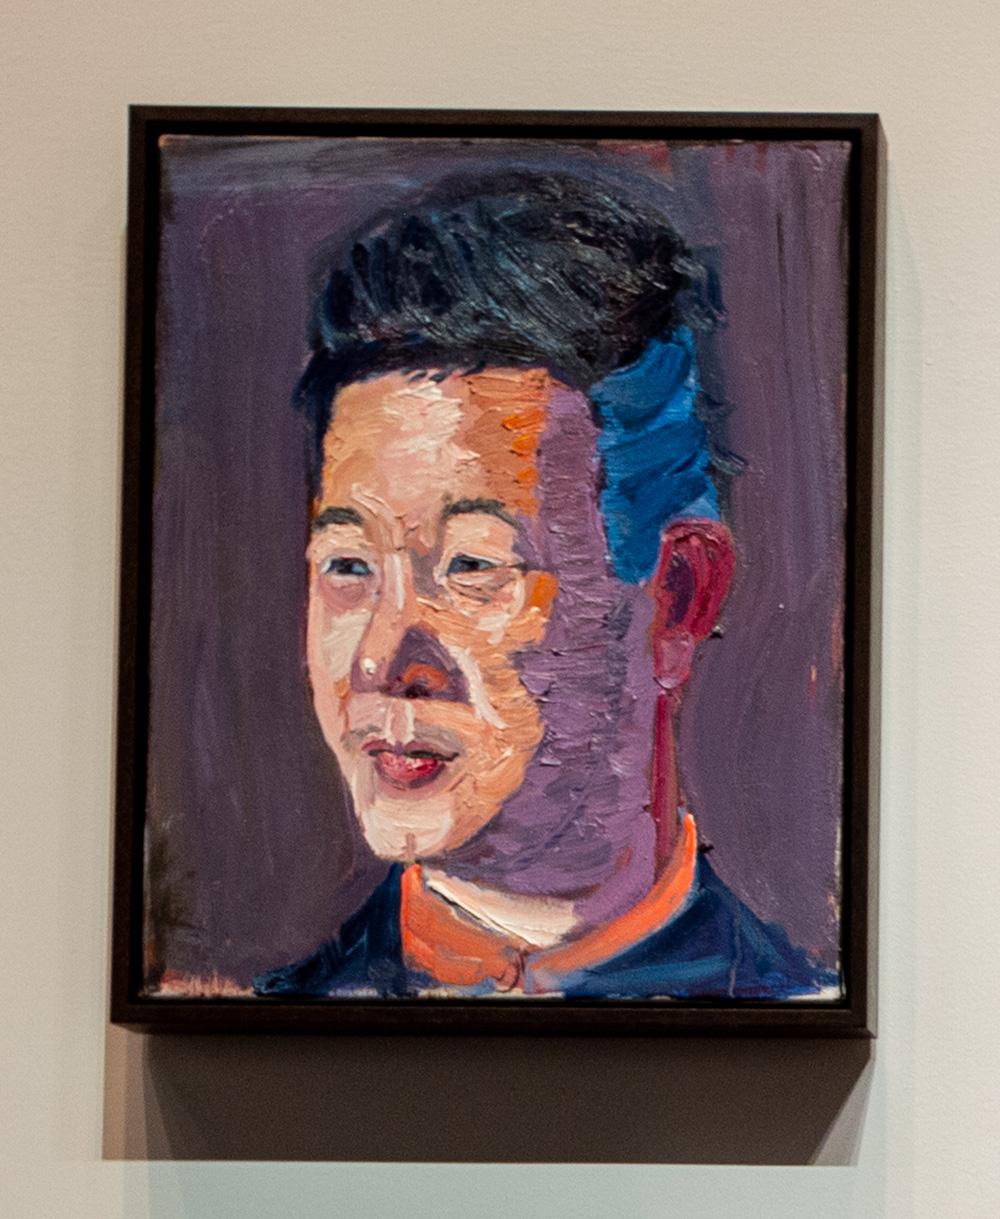 A portrait of Joseph Kim by former President George W. Bush.